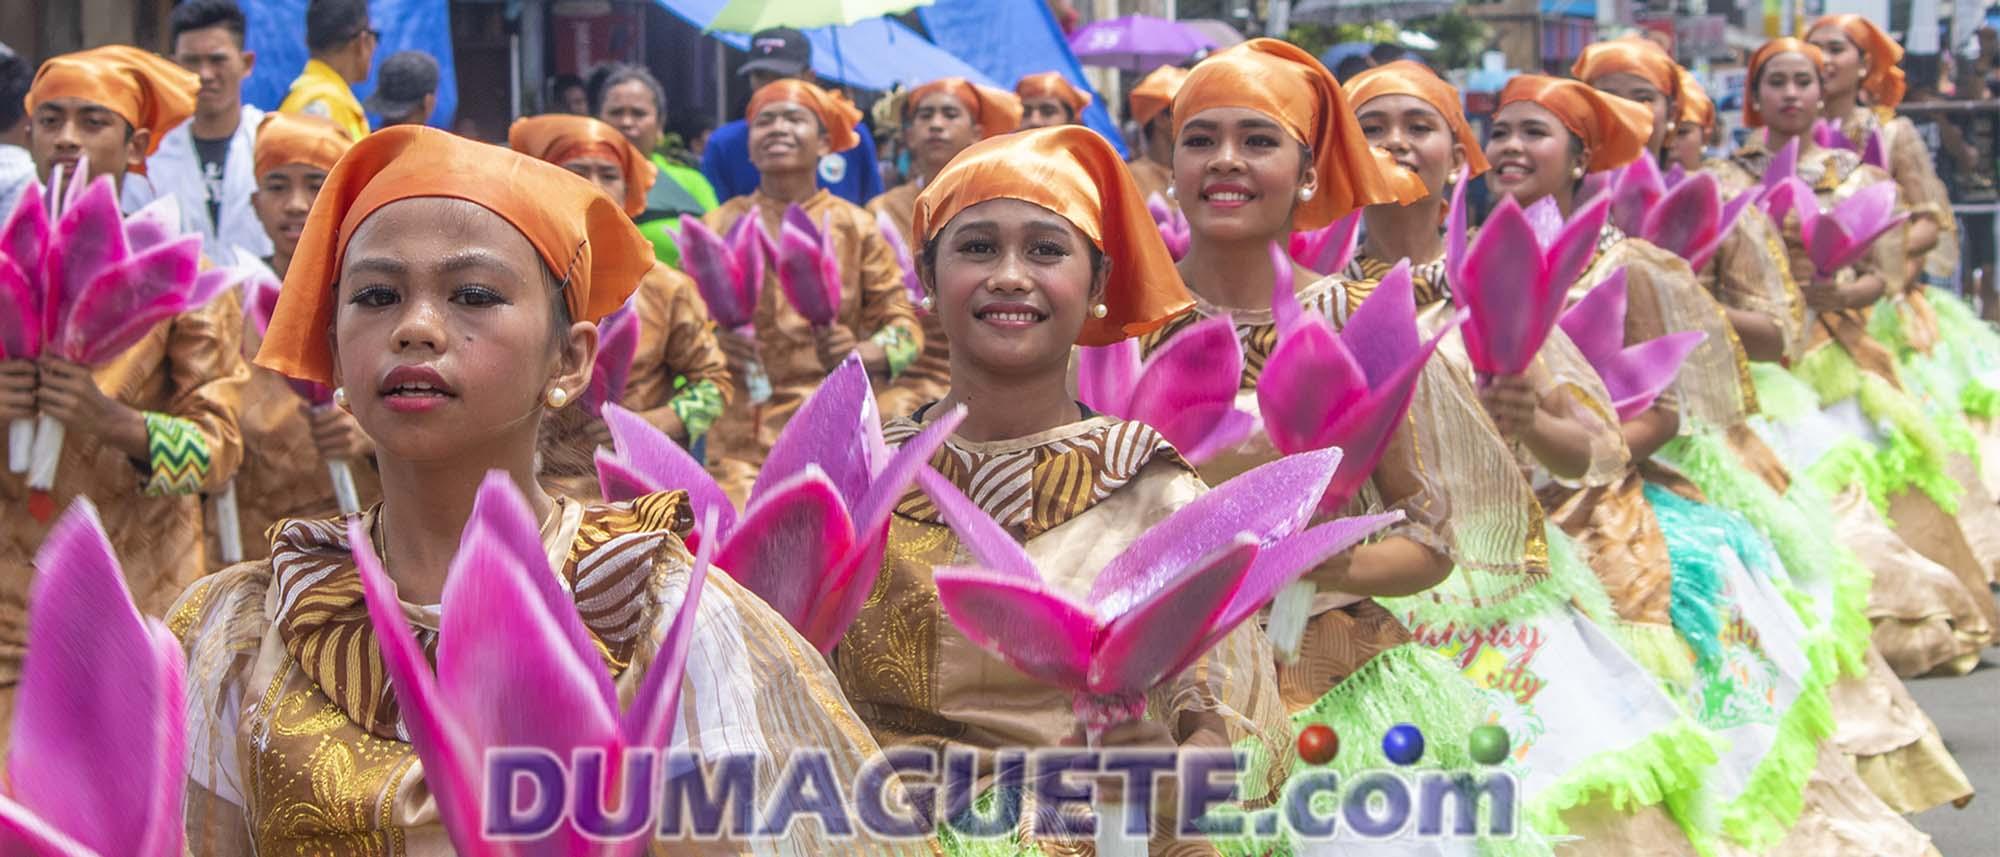 Sinulog Festival 2019 in Tanjay City - Street Dancing